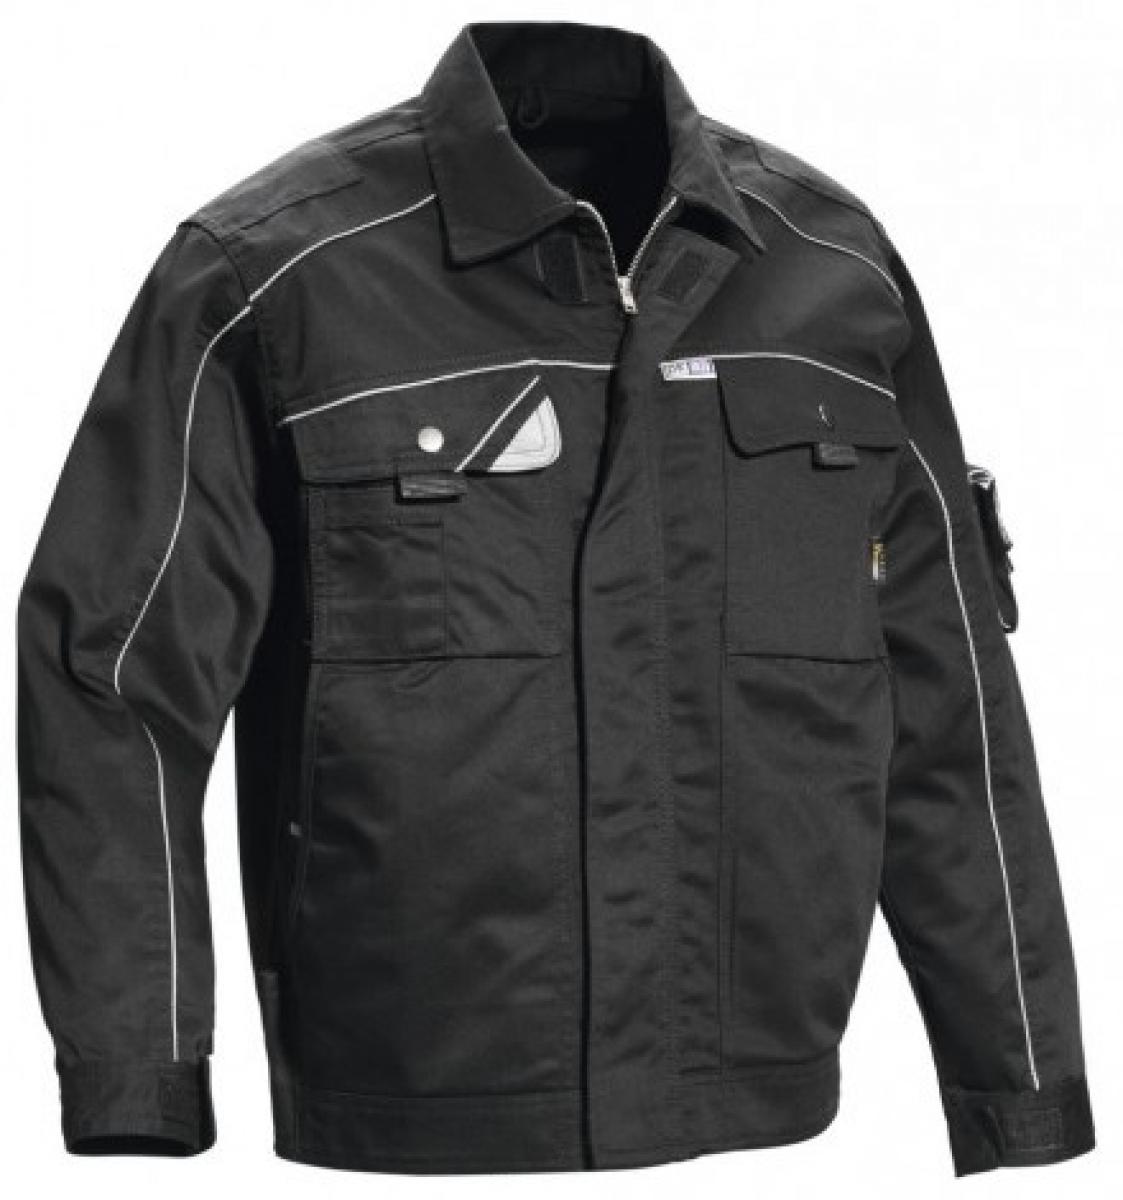 PKA-Arbeits-Berufs-Bund-Jacke, Blouson, Black Revolution, MG320, schwarz